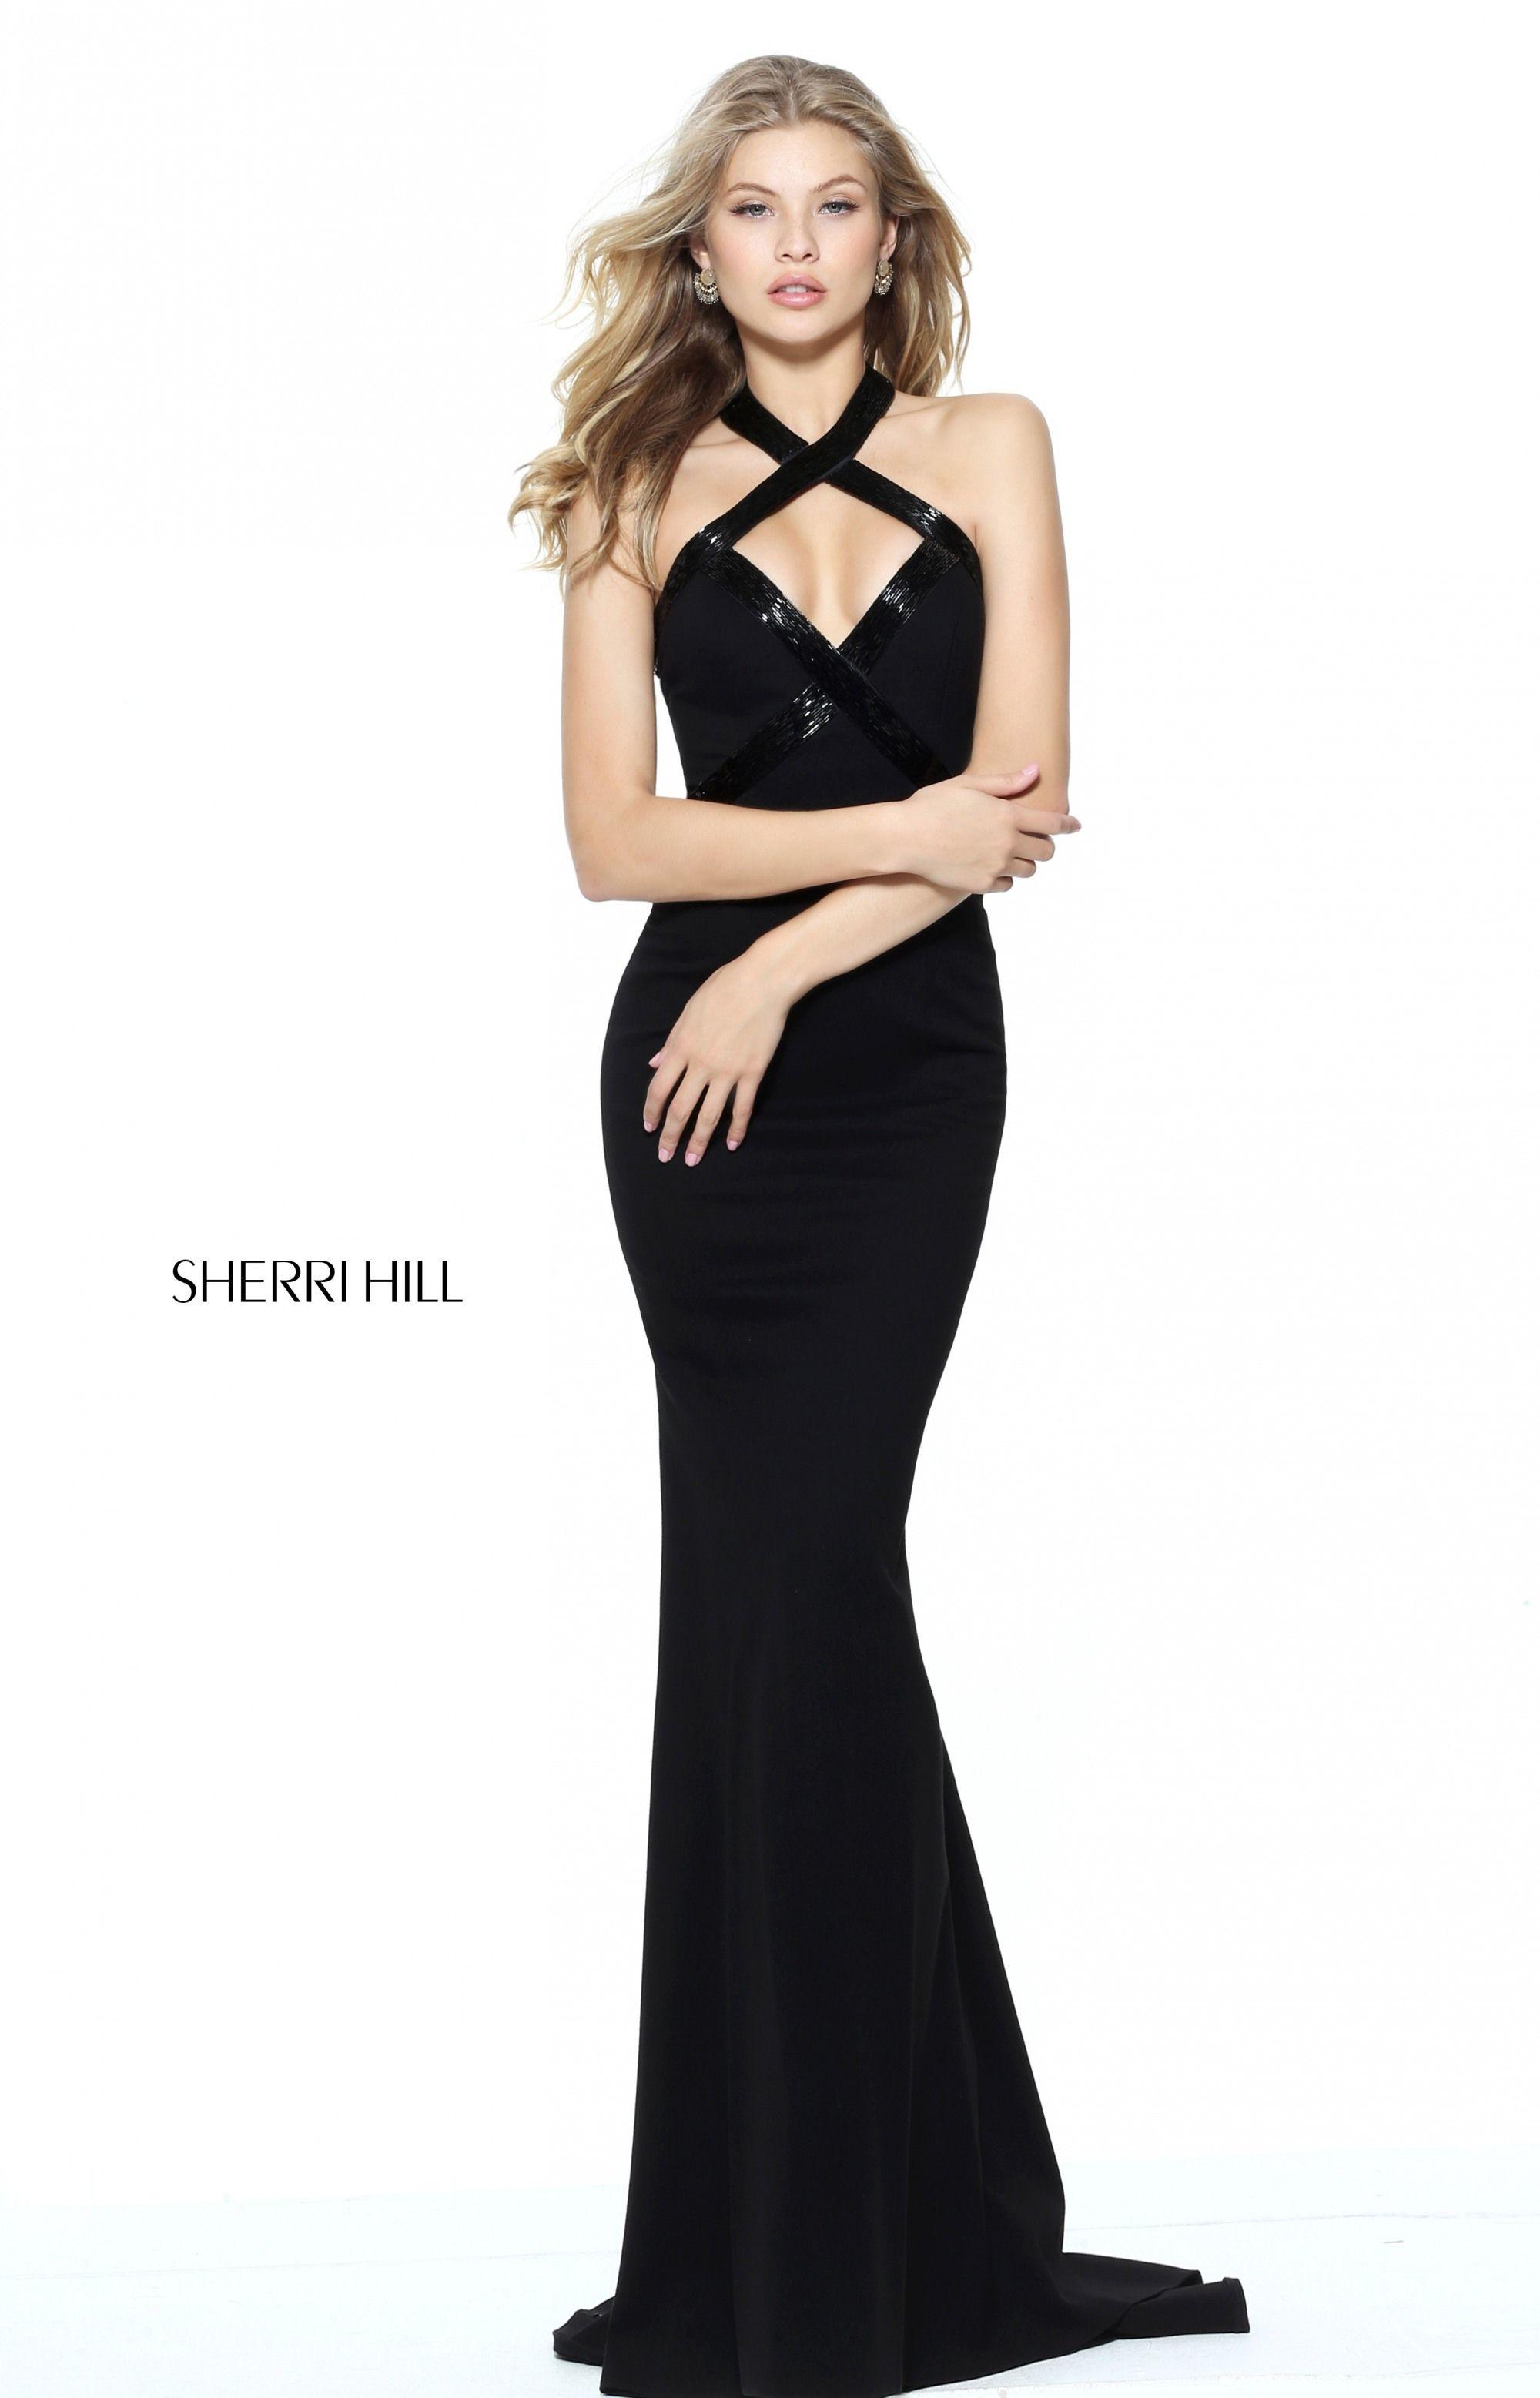 0a6c52e2f6e0 Sherri Hill 50865 - International Prom Association Skolejubilæumskjoler